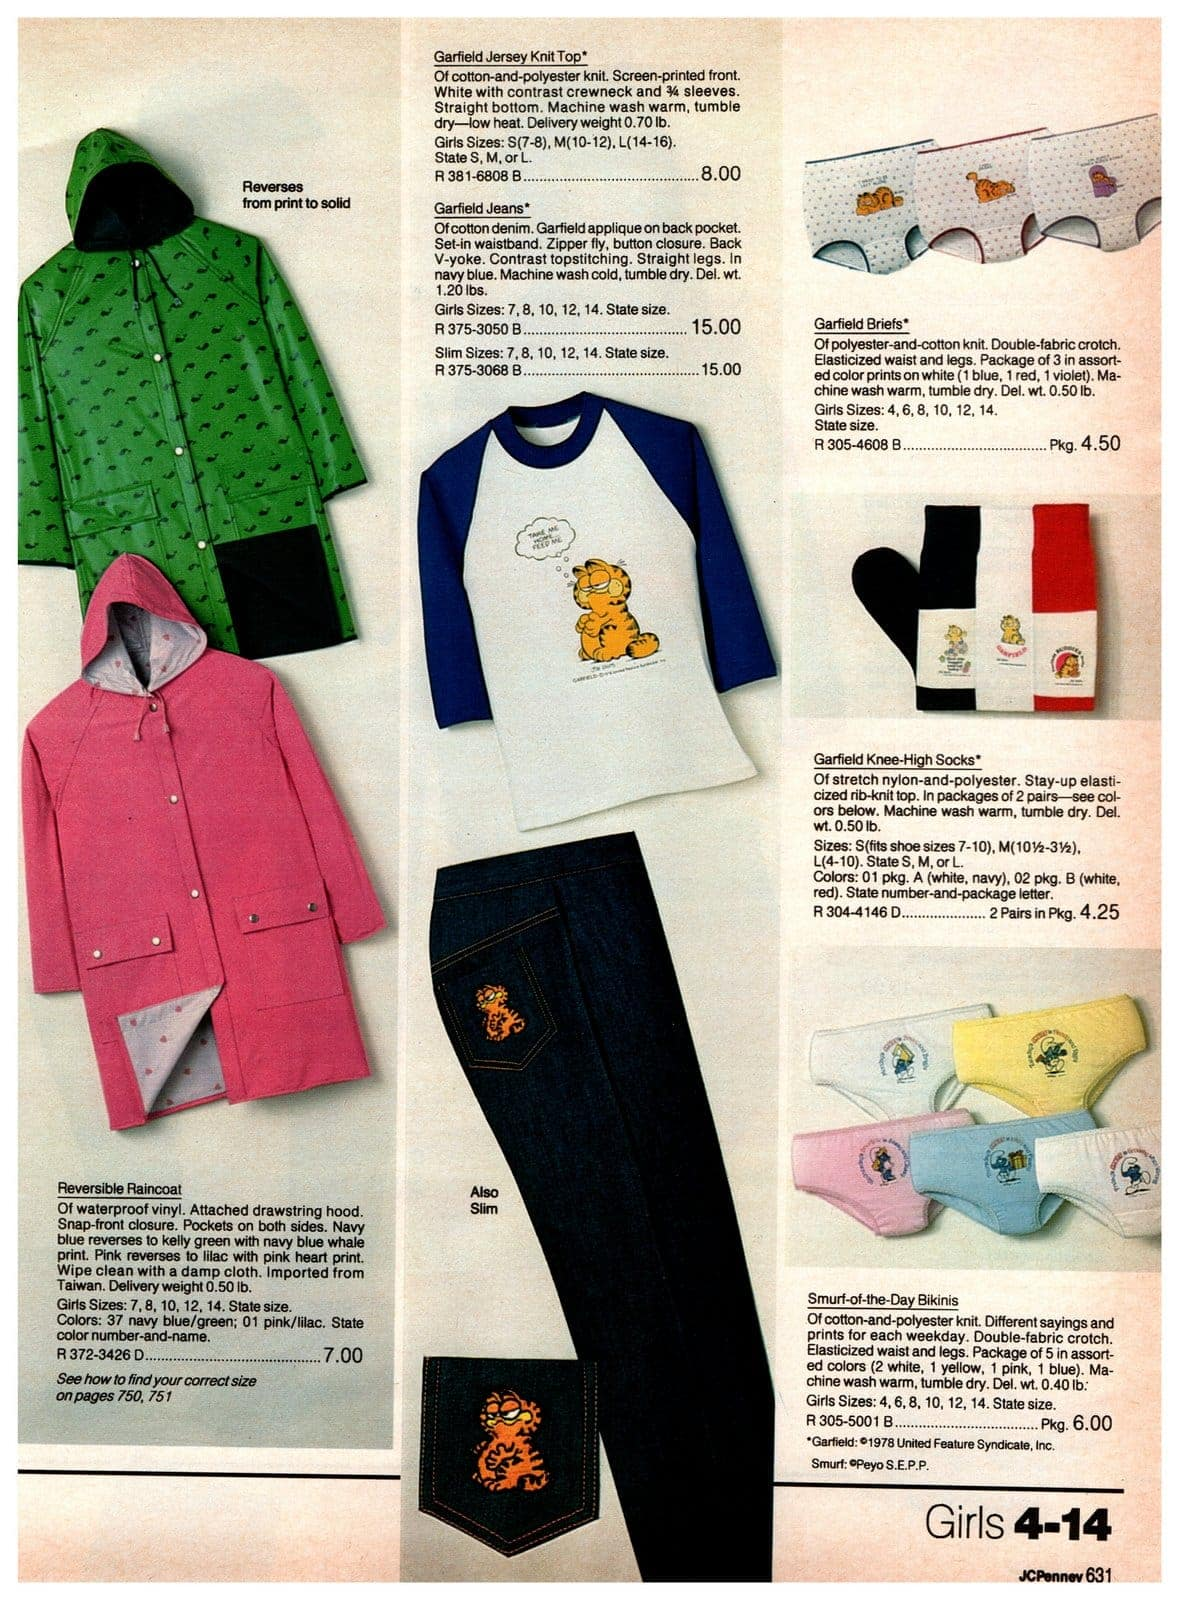 Reversible raincoats, Garfield shirts and pants, plus Garfield and Smurfs underwear and socks